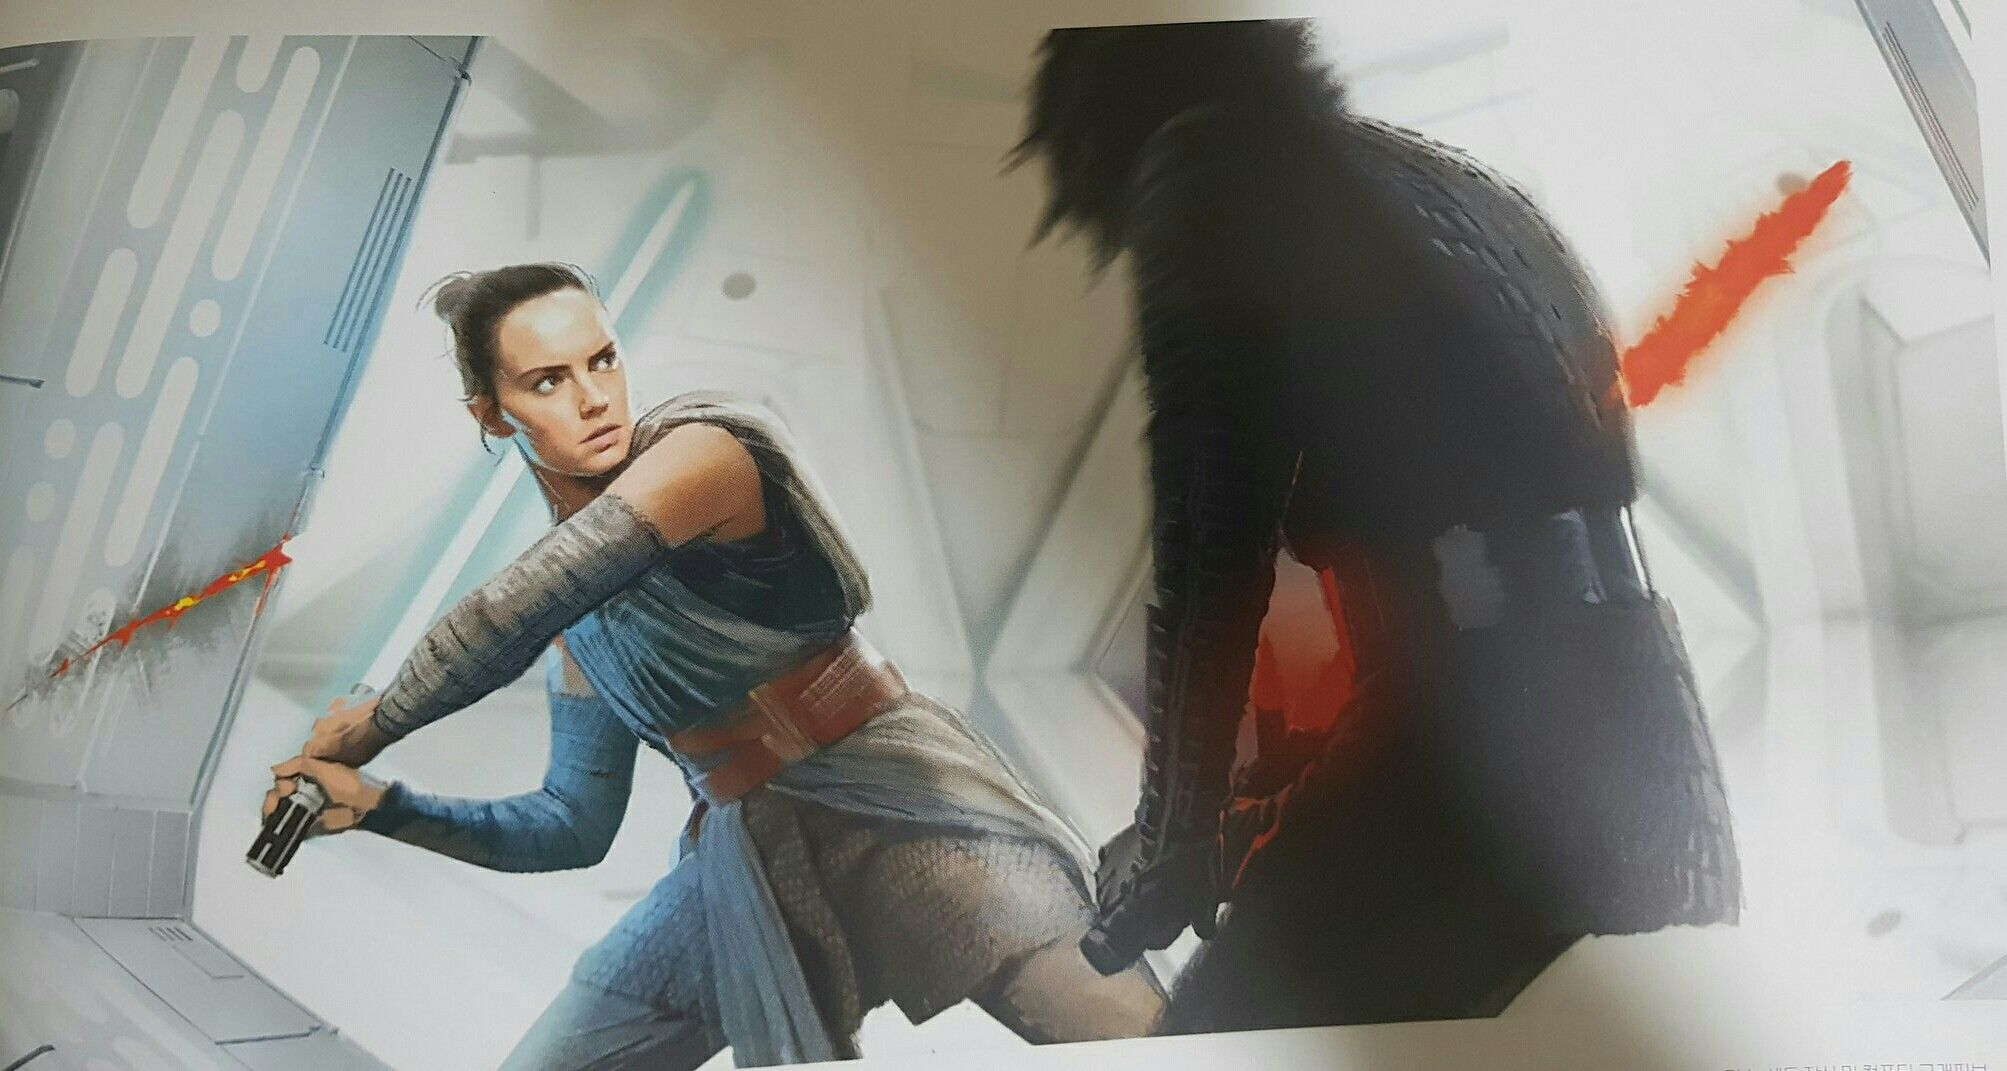 Rey Vs Kylo The Art Of The Rise Of Skywalker Korea Rey Starwars Theriseofskywalker Star Wars Books Star Wars Fandom Star Wars Novels